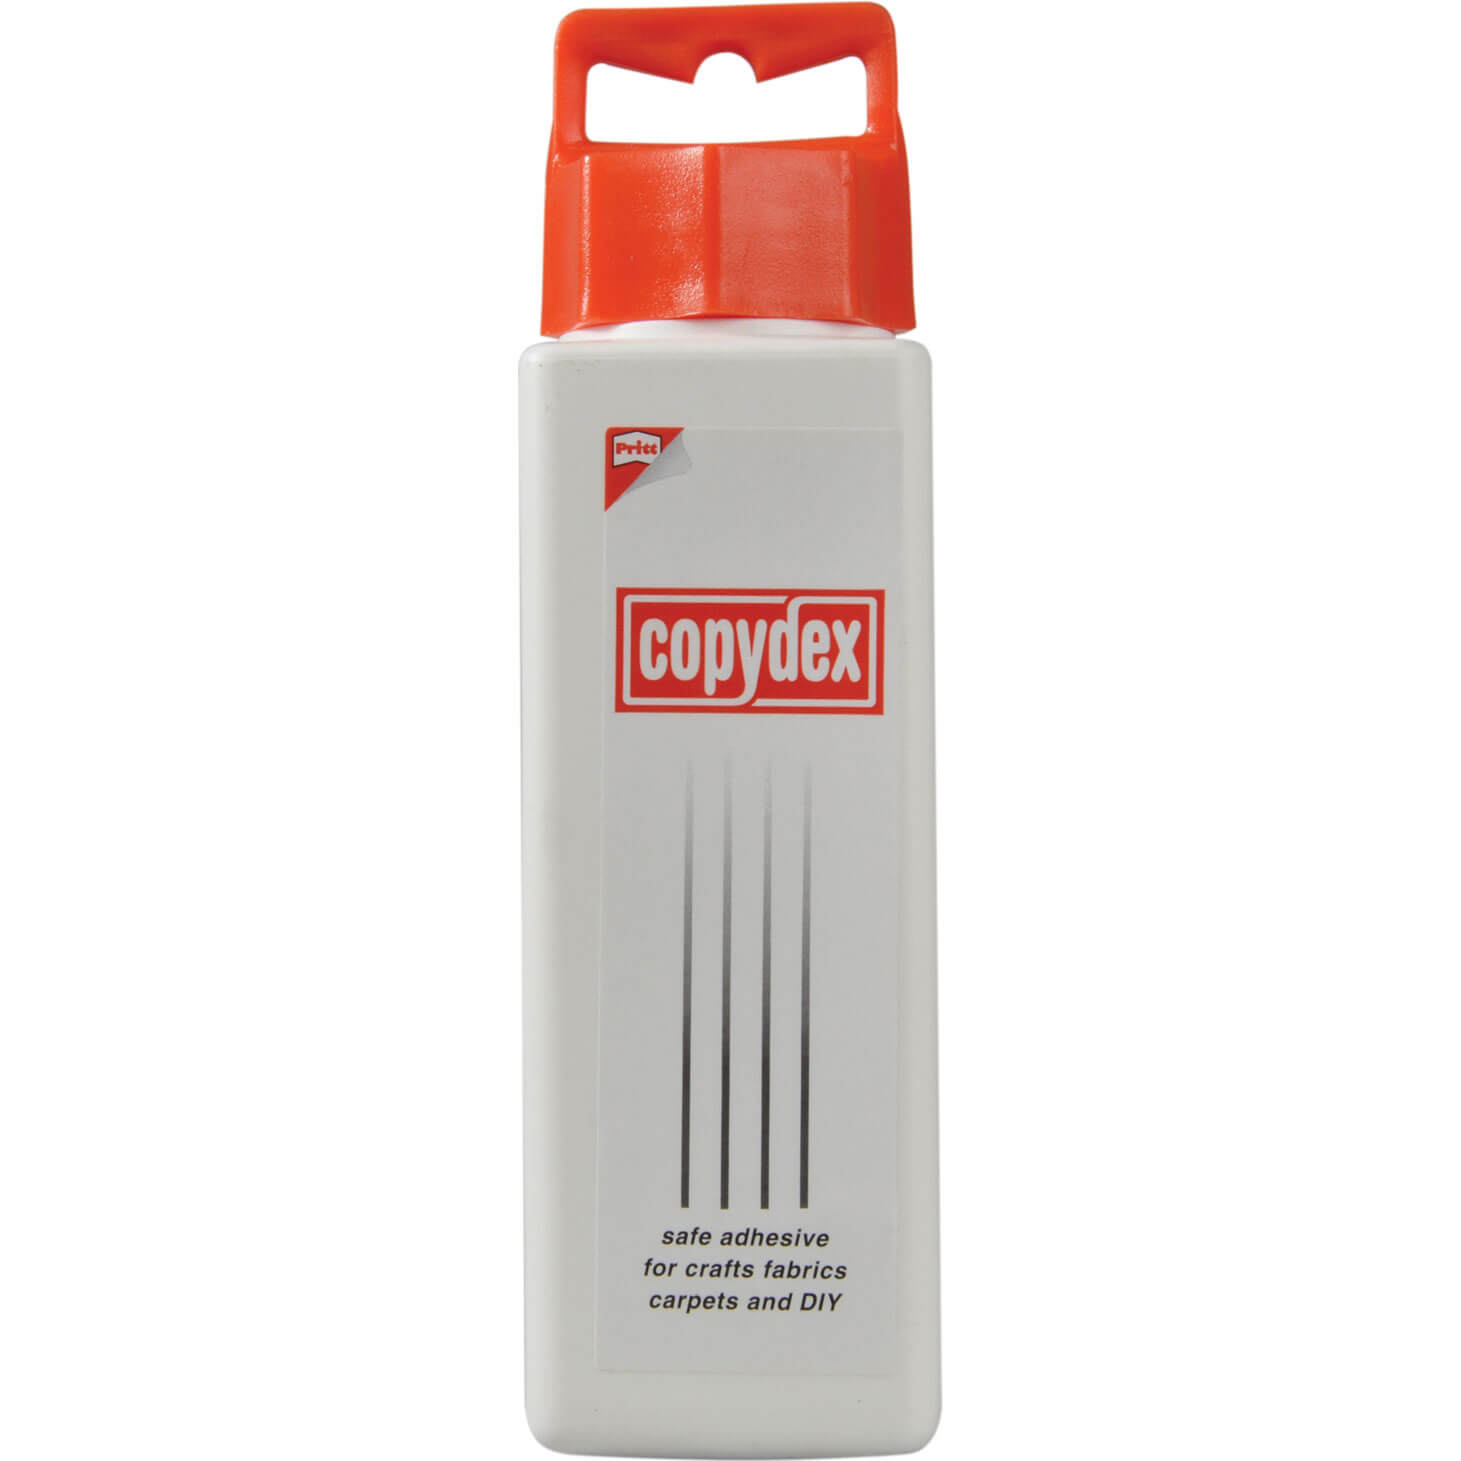 Image of Copydex Adhesive 250ml